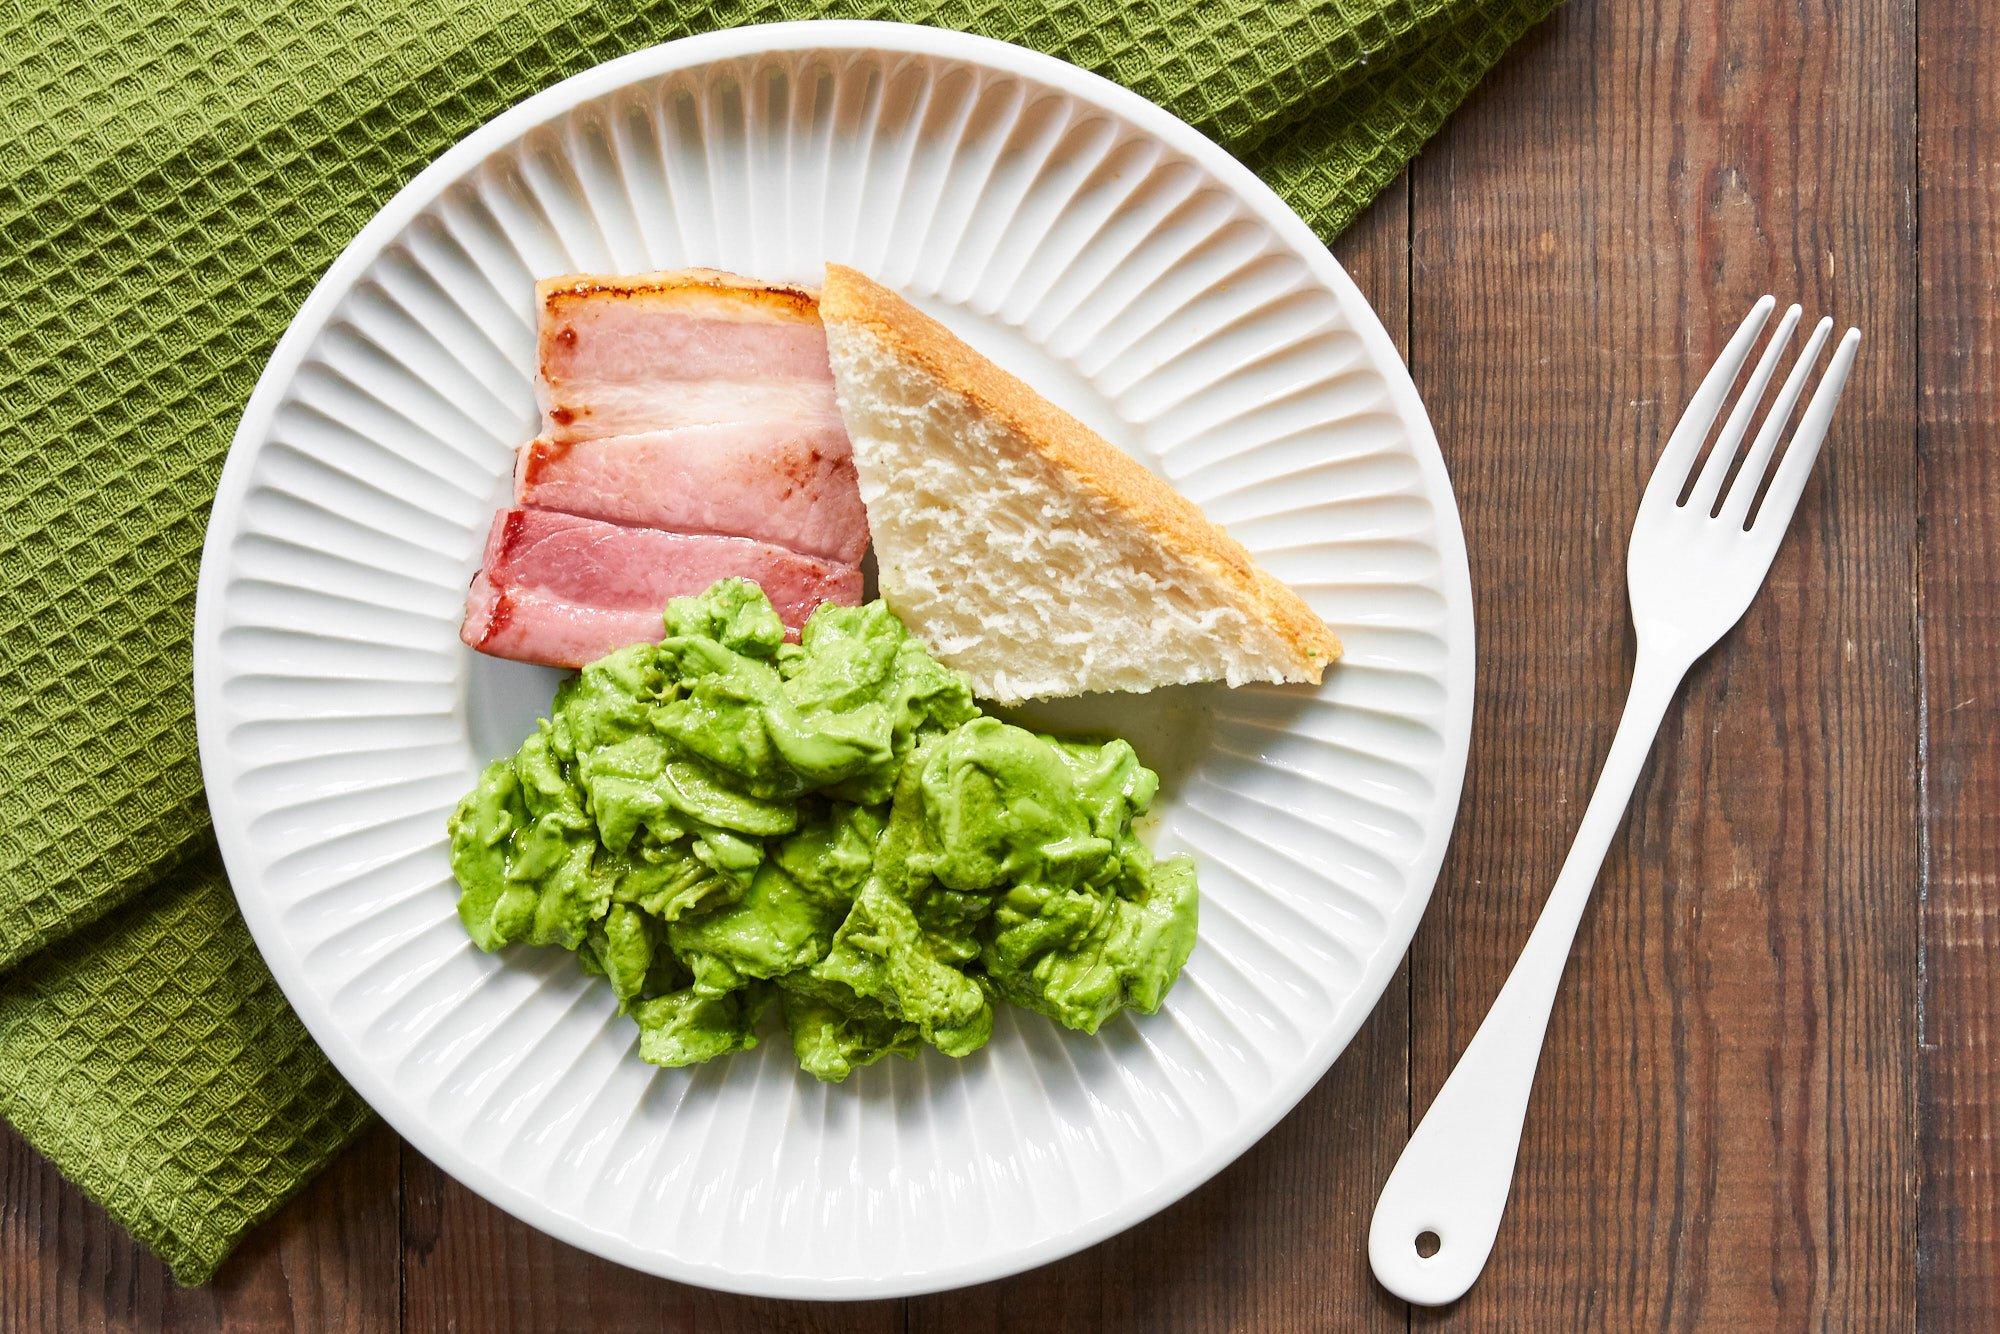 Scrambled green egg whites and ham uses matcha powder to turn the eggs green.